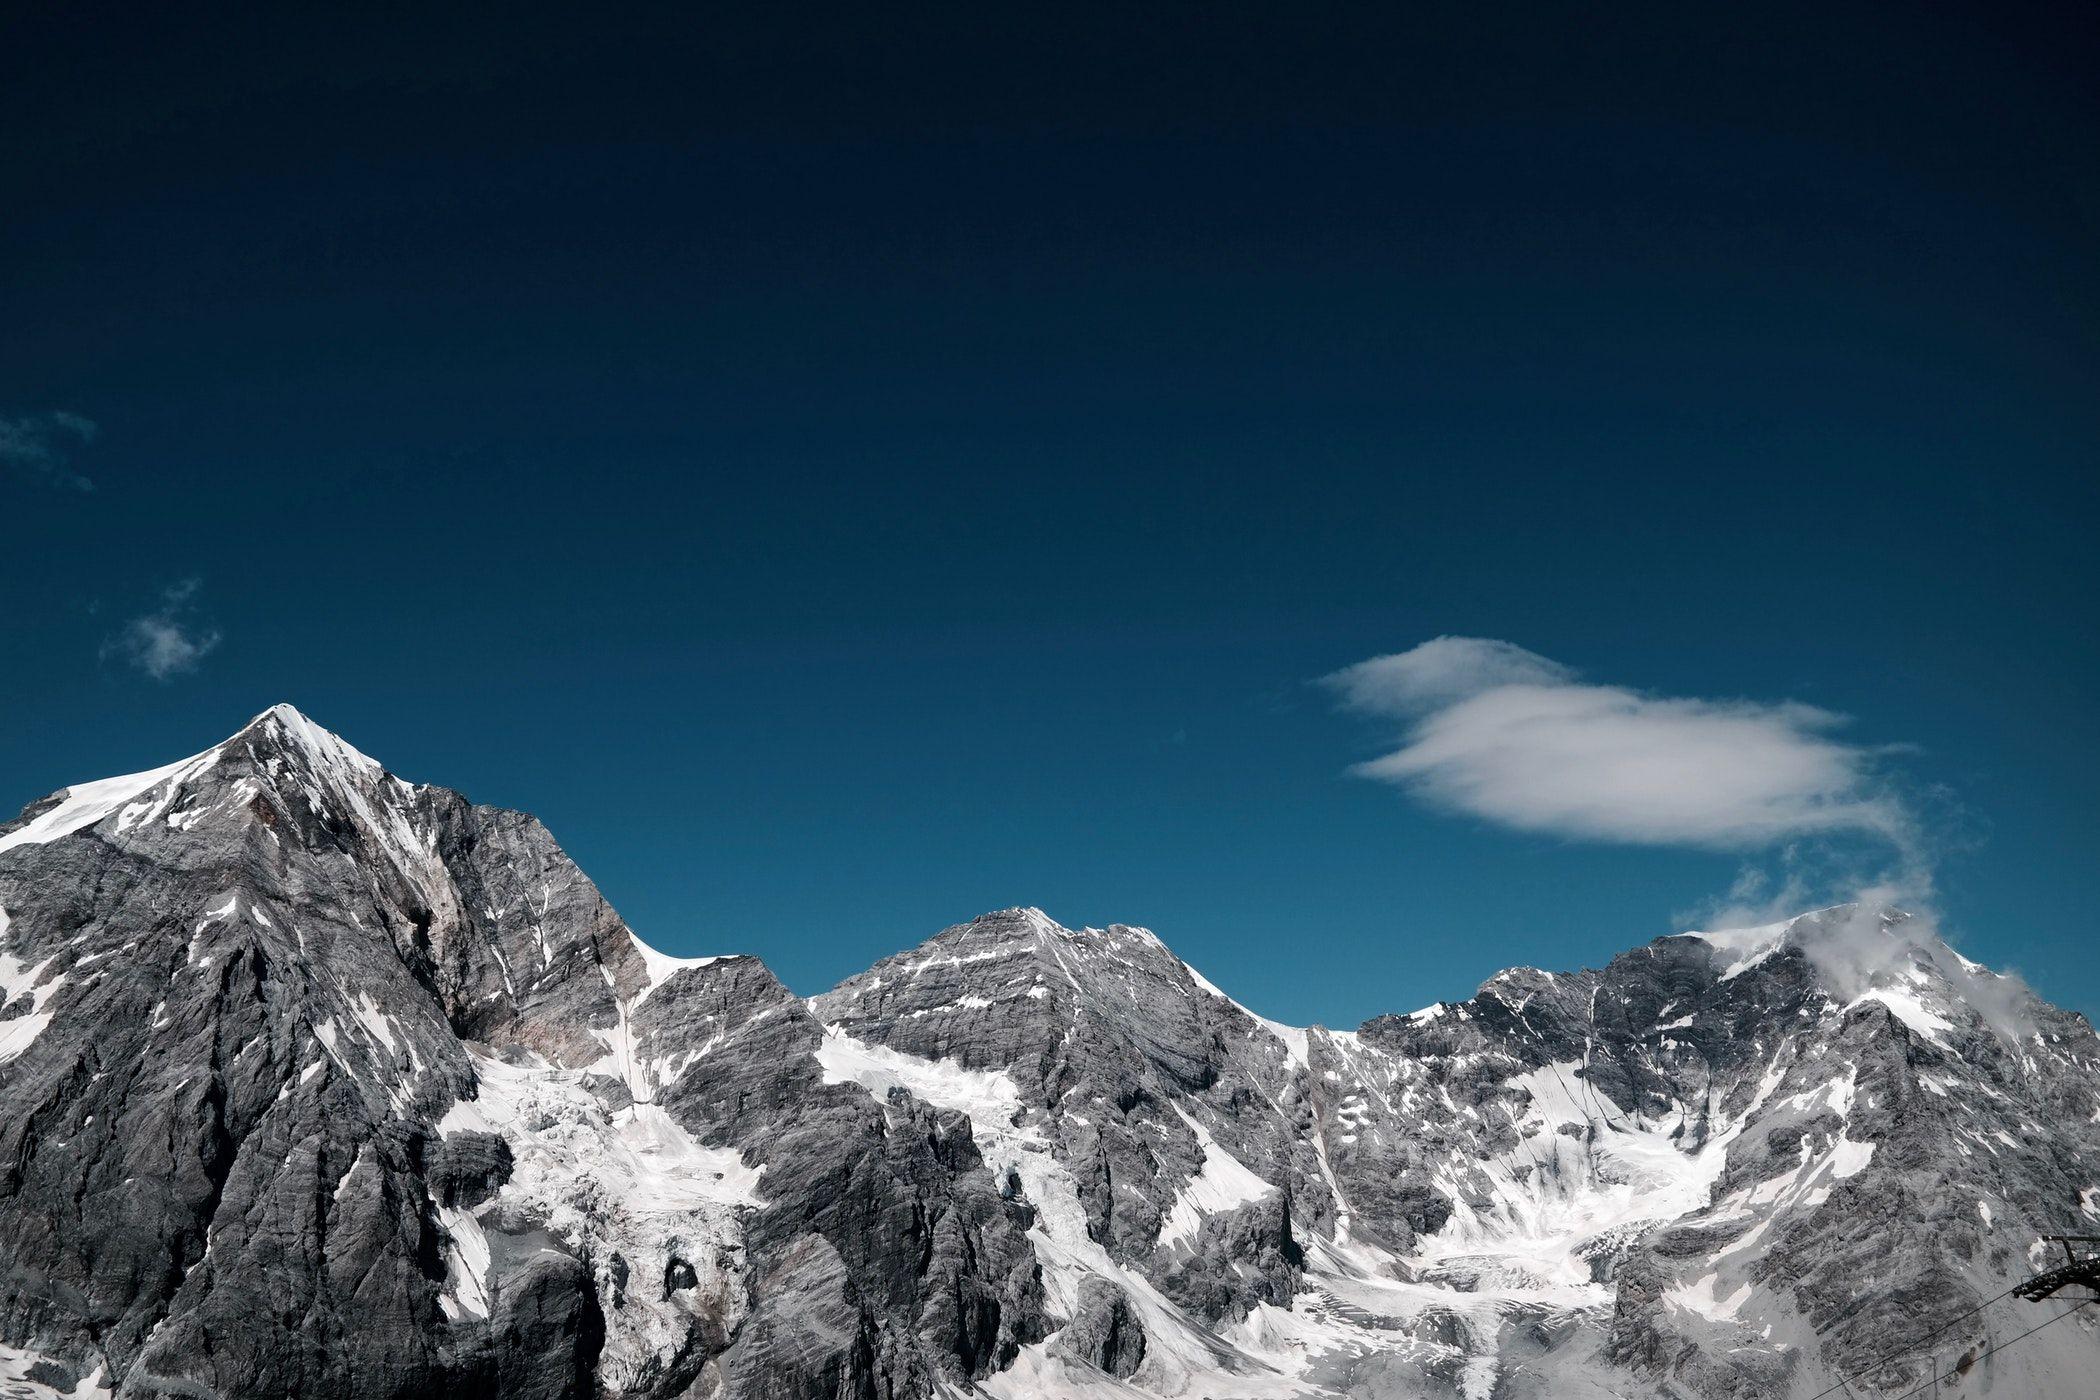 Peak, mountain peak, snow and mountains HD photo by Julian